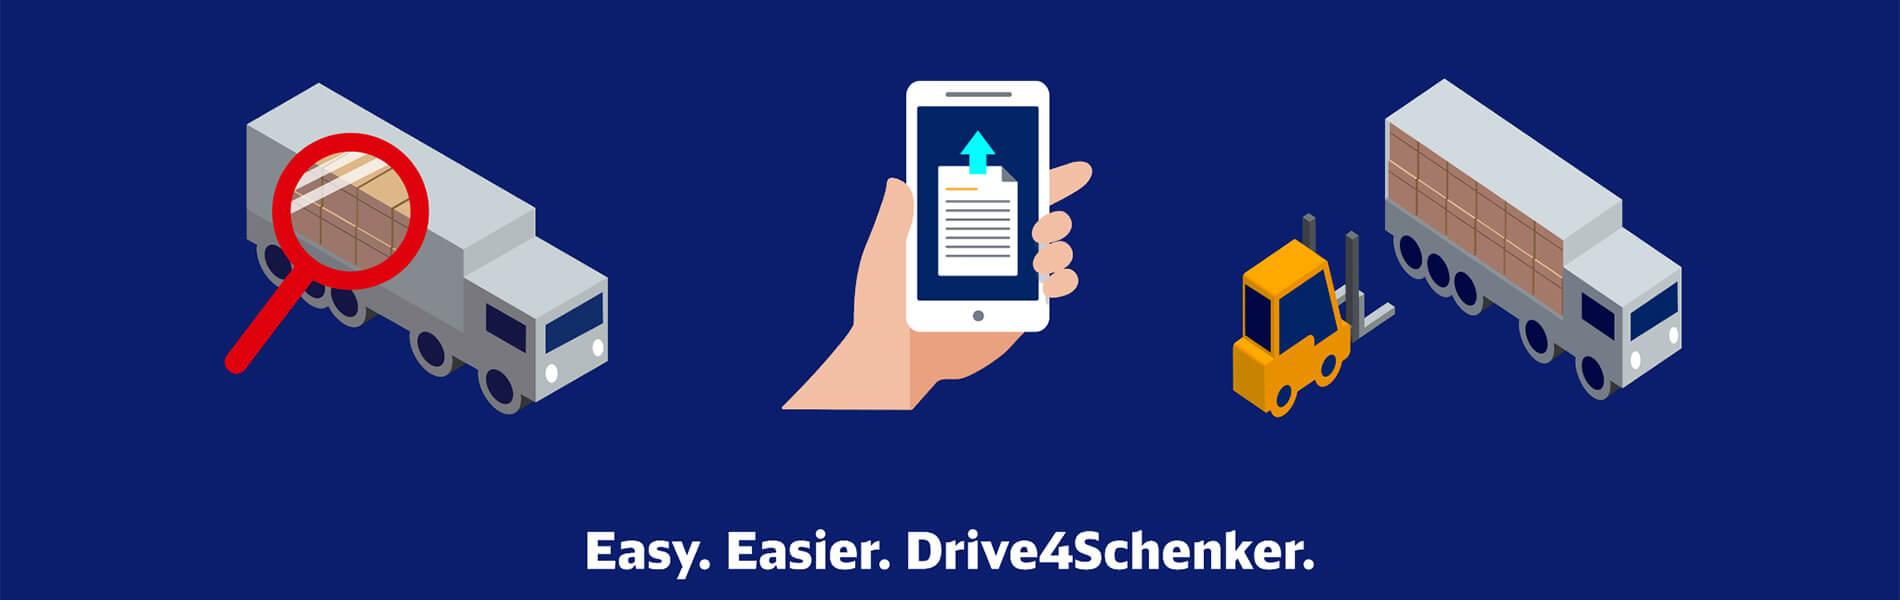 Frachtplattform Drive4Schenker: Warum Carrier, Fahrer & Disponenten profitieren